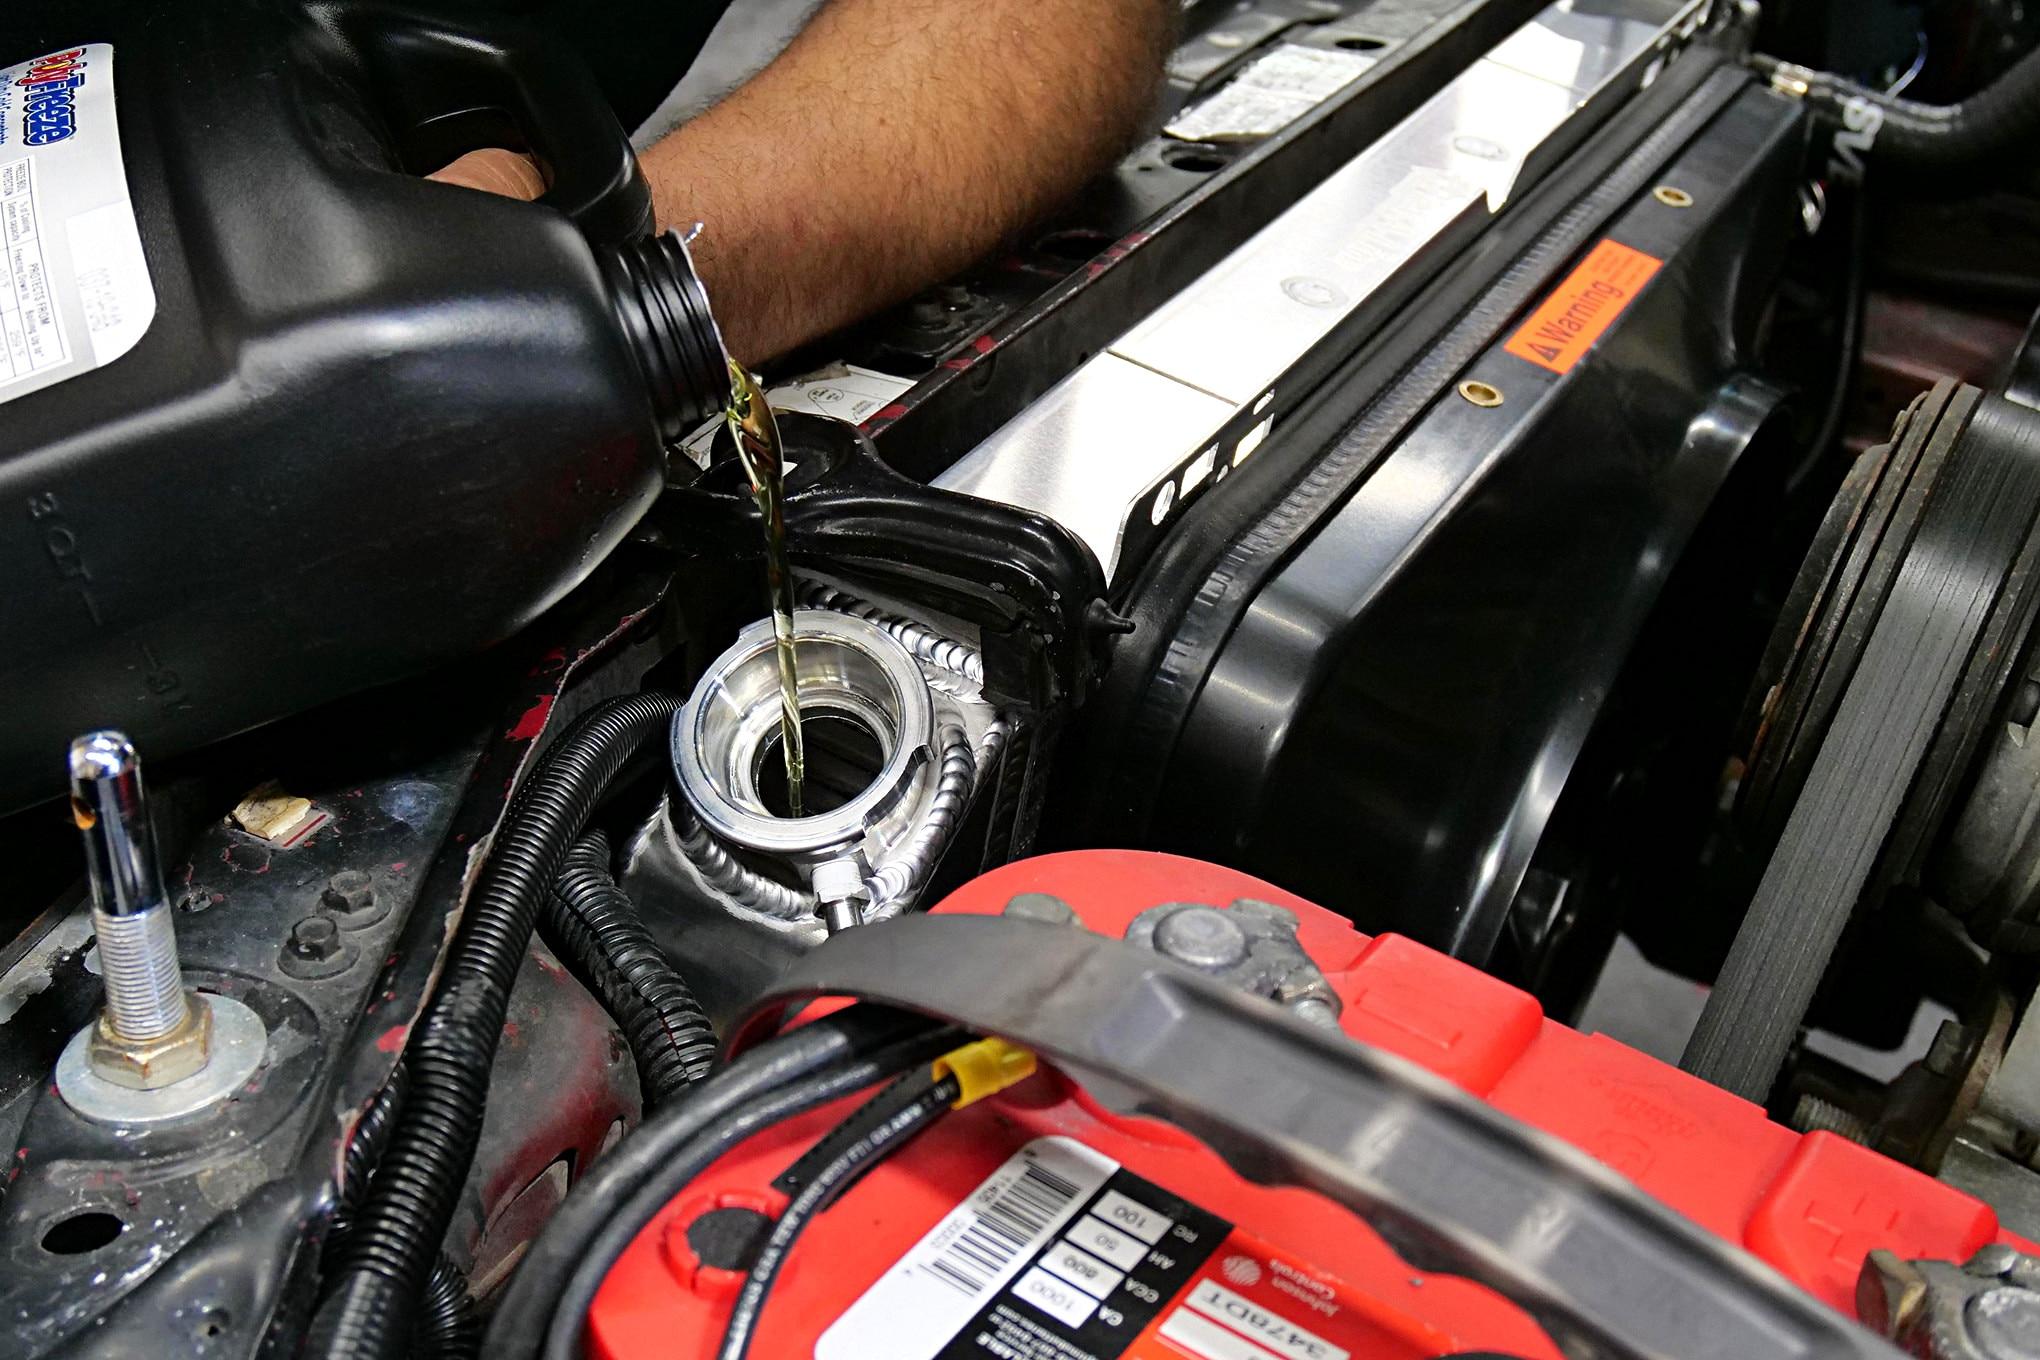 018 Mustang Flex A Lite Radiator Fan Coolant